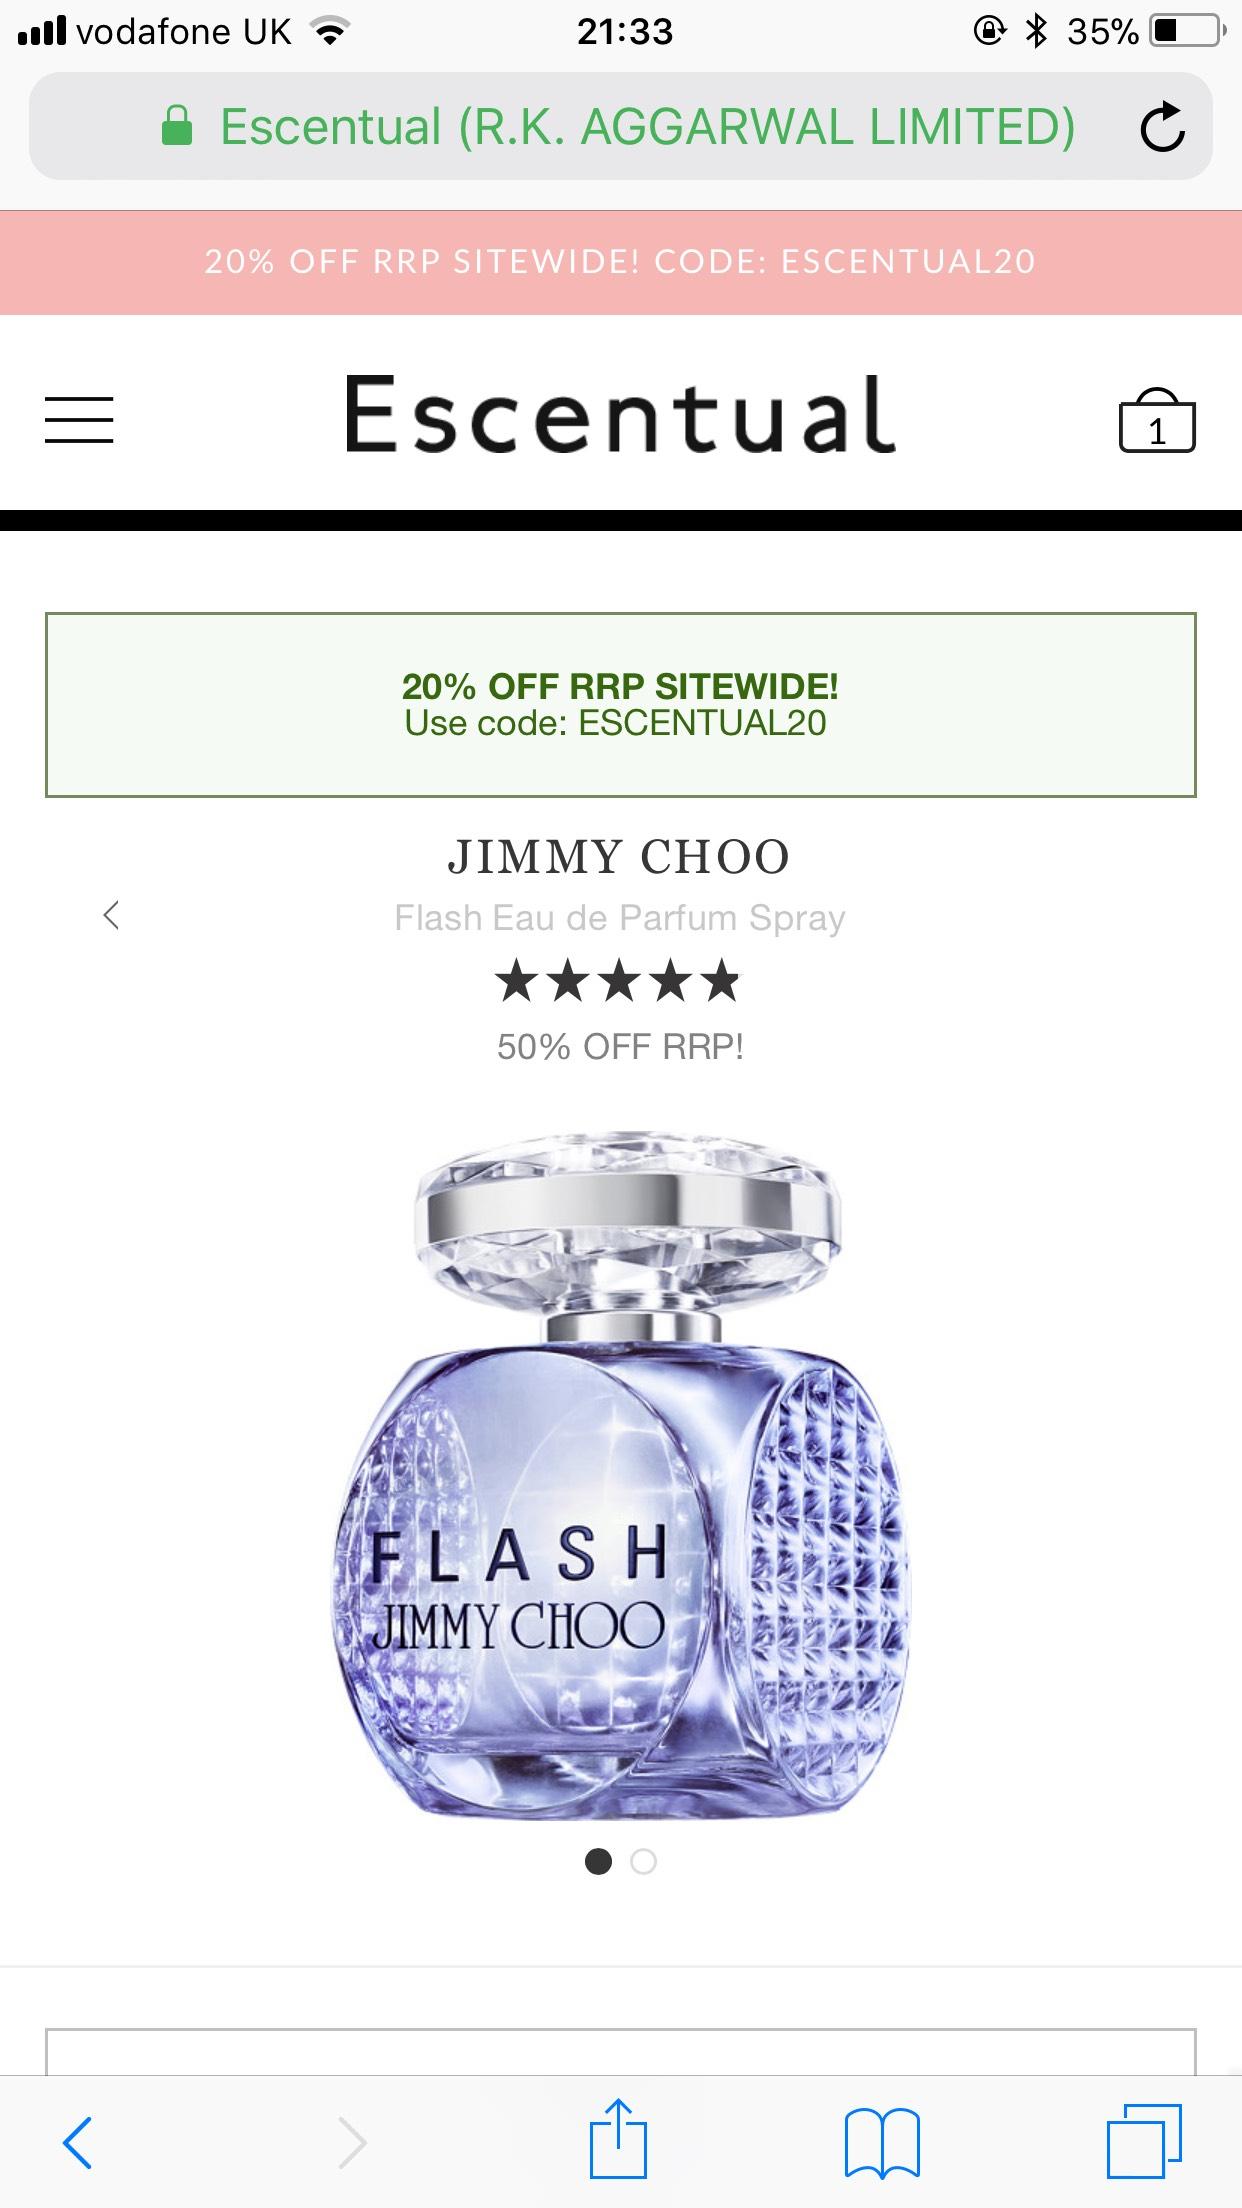 Jimmy choo flash edp 60ml at Escentual for £20.35